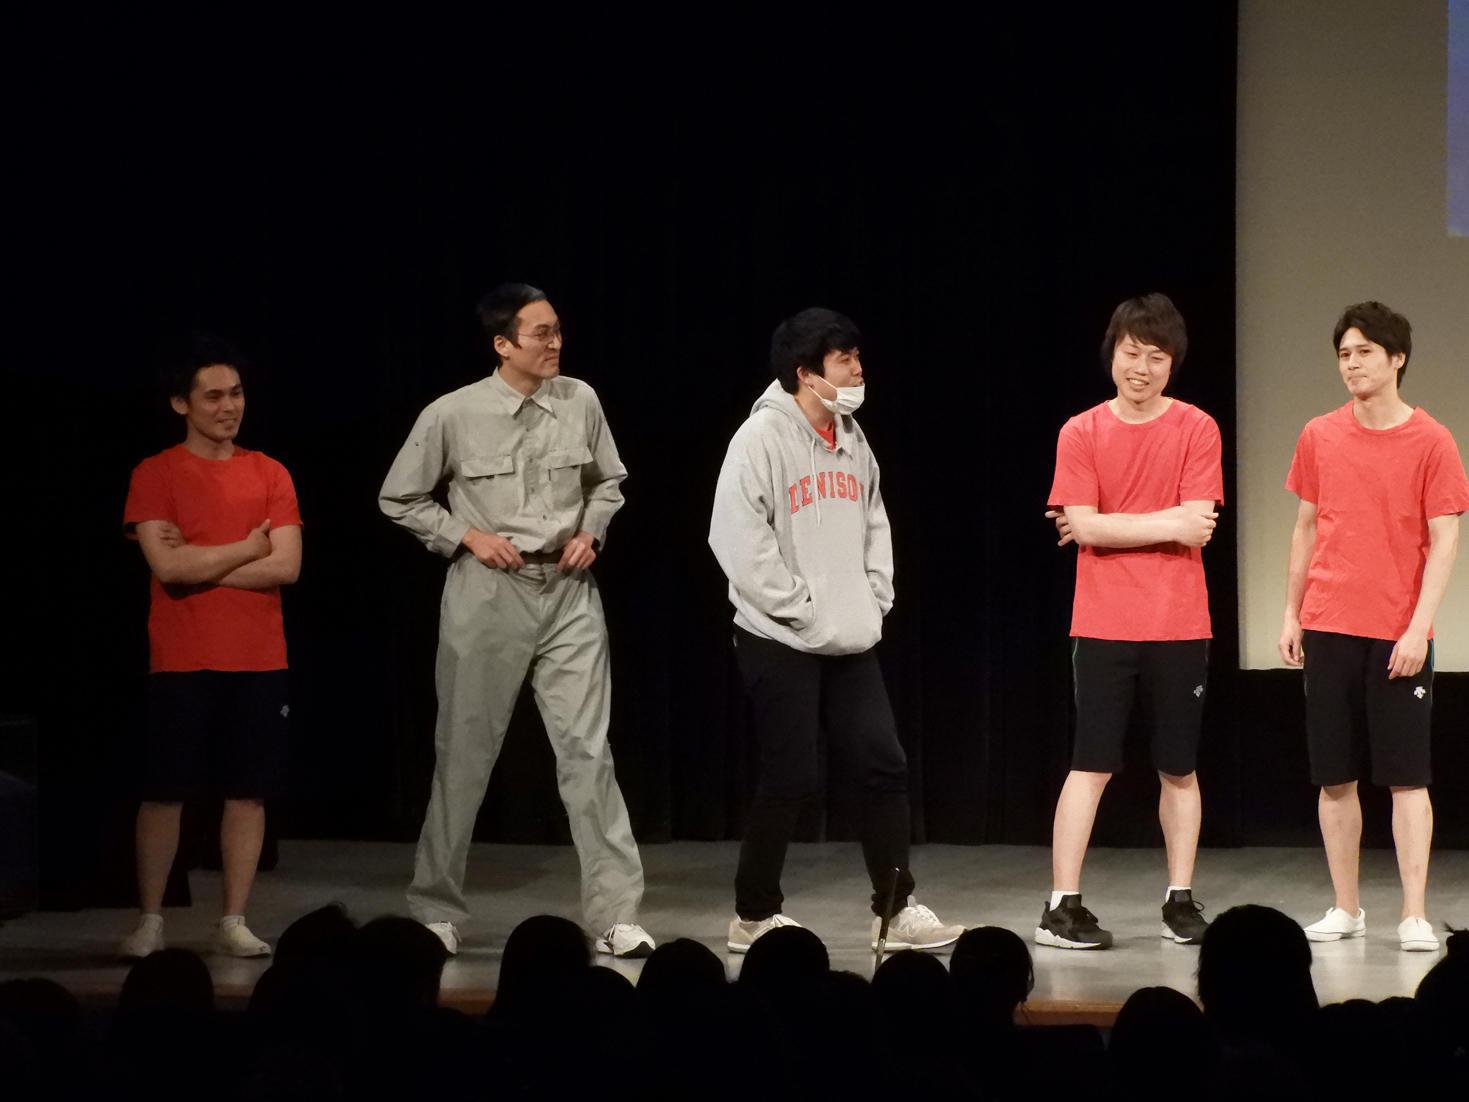 http://news.yoshimoto.co.jp/20180404103312-faec26551b836c4e4efdbddafbf175c0df8e1049.jpg